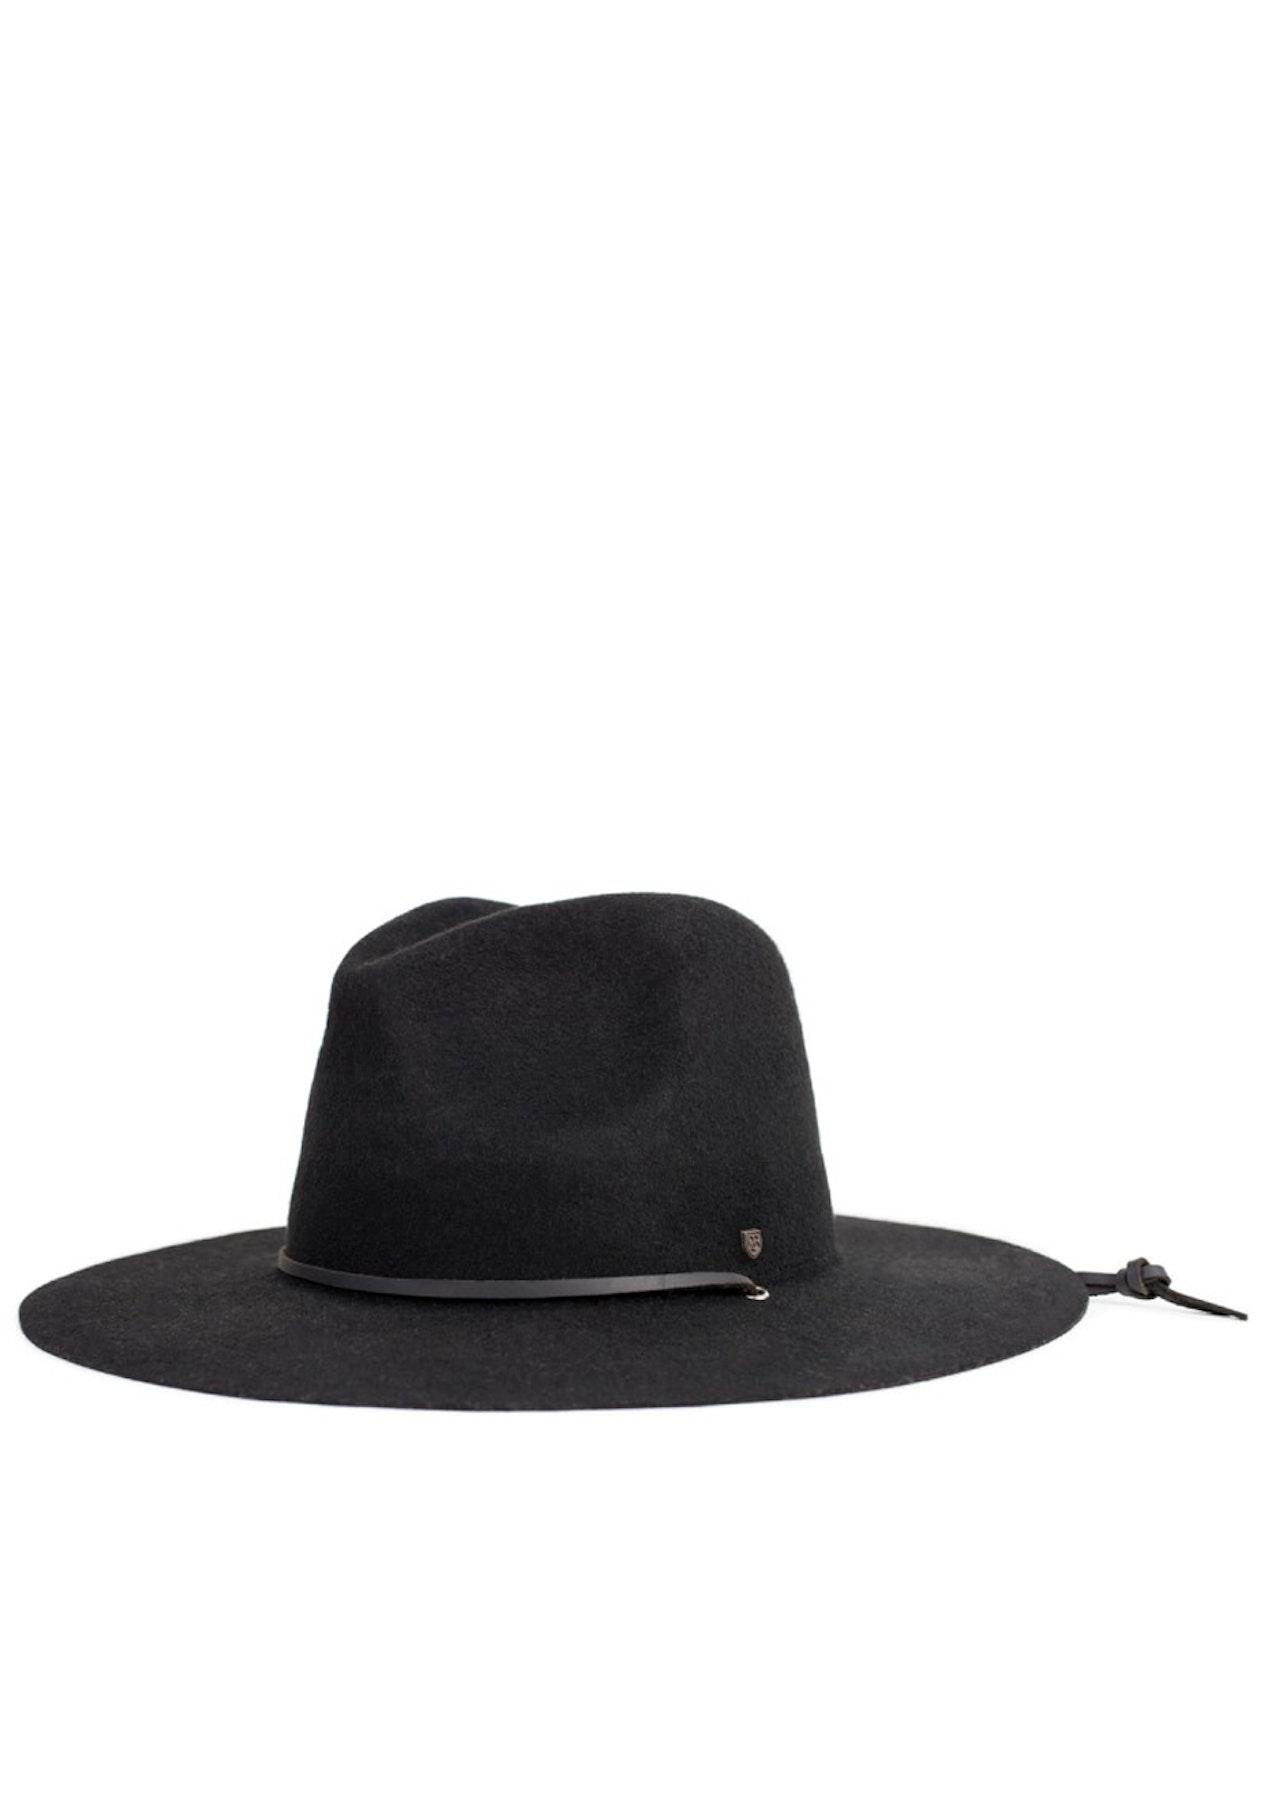 48502001d88 Brixton - Mayfield II Hat - Black - Men s Mixed Brands - Onceit